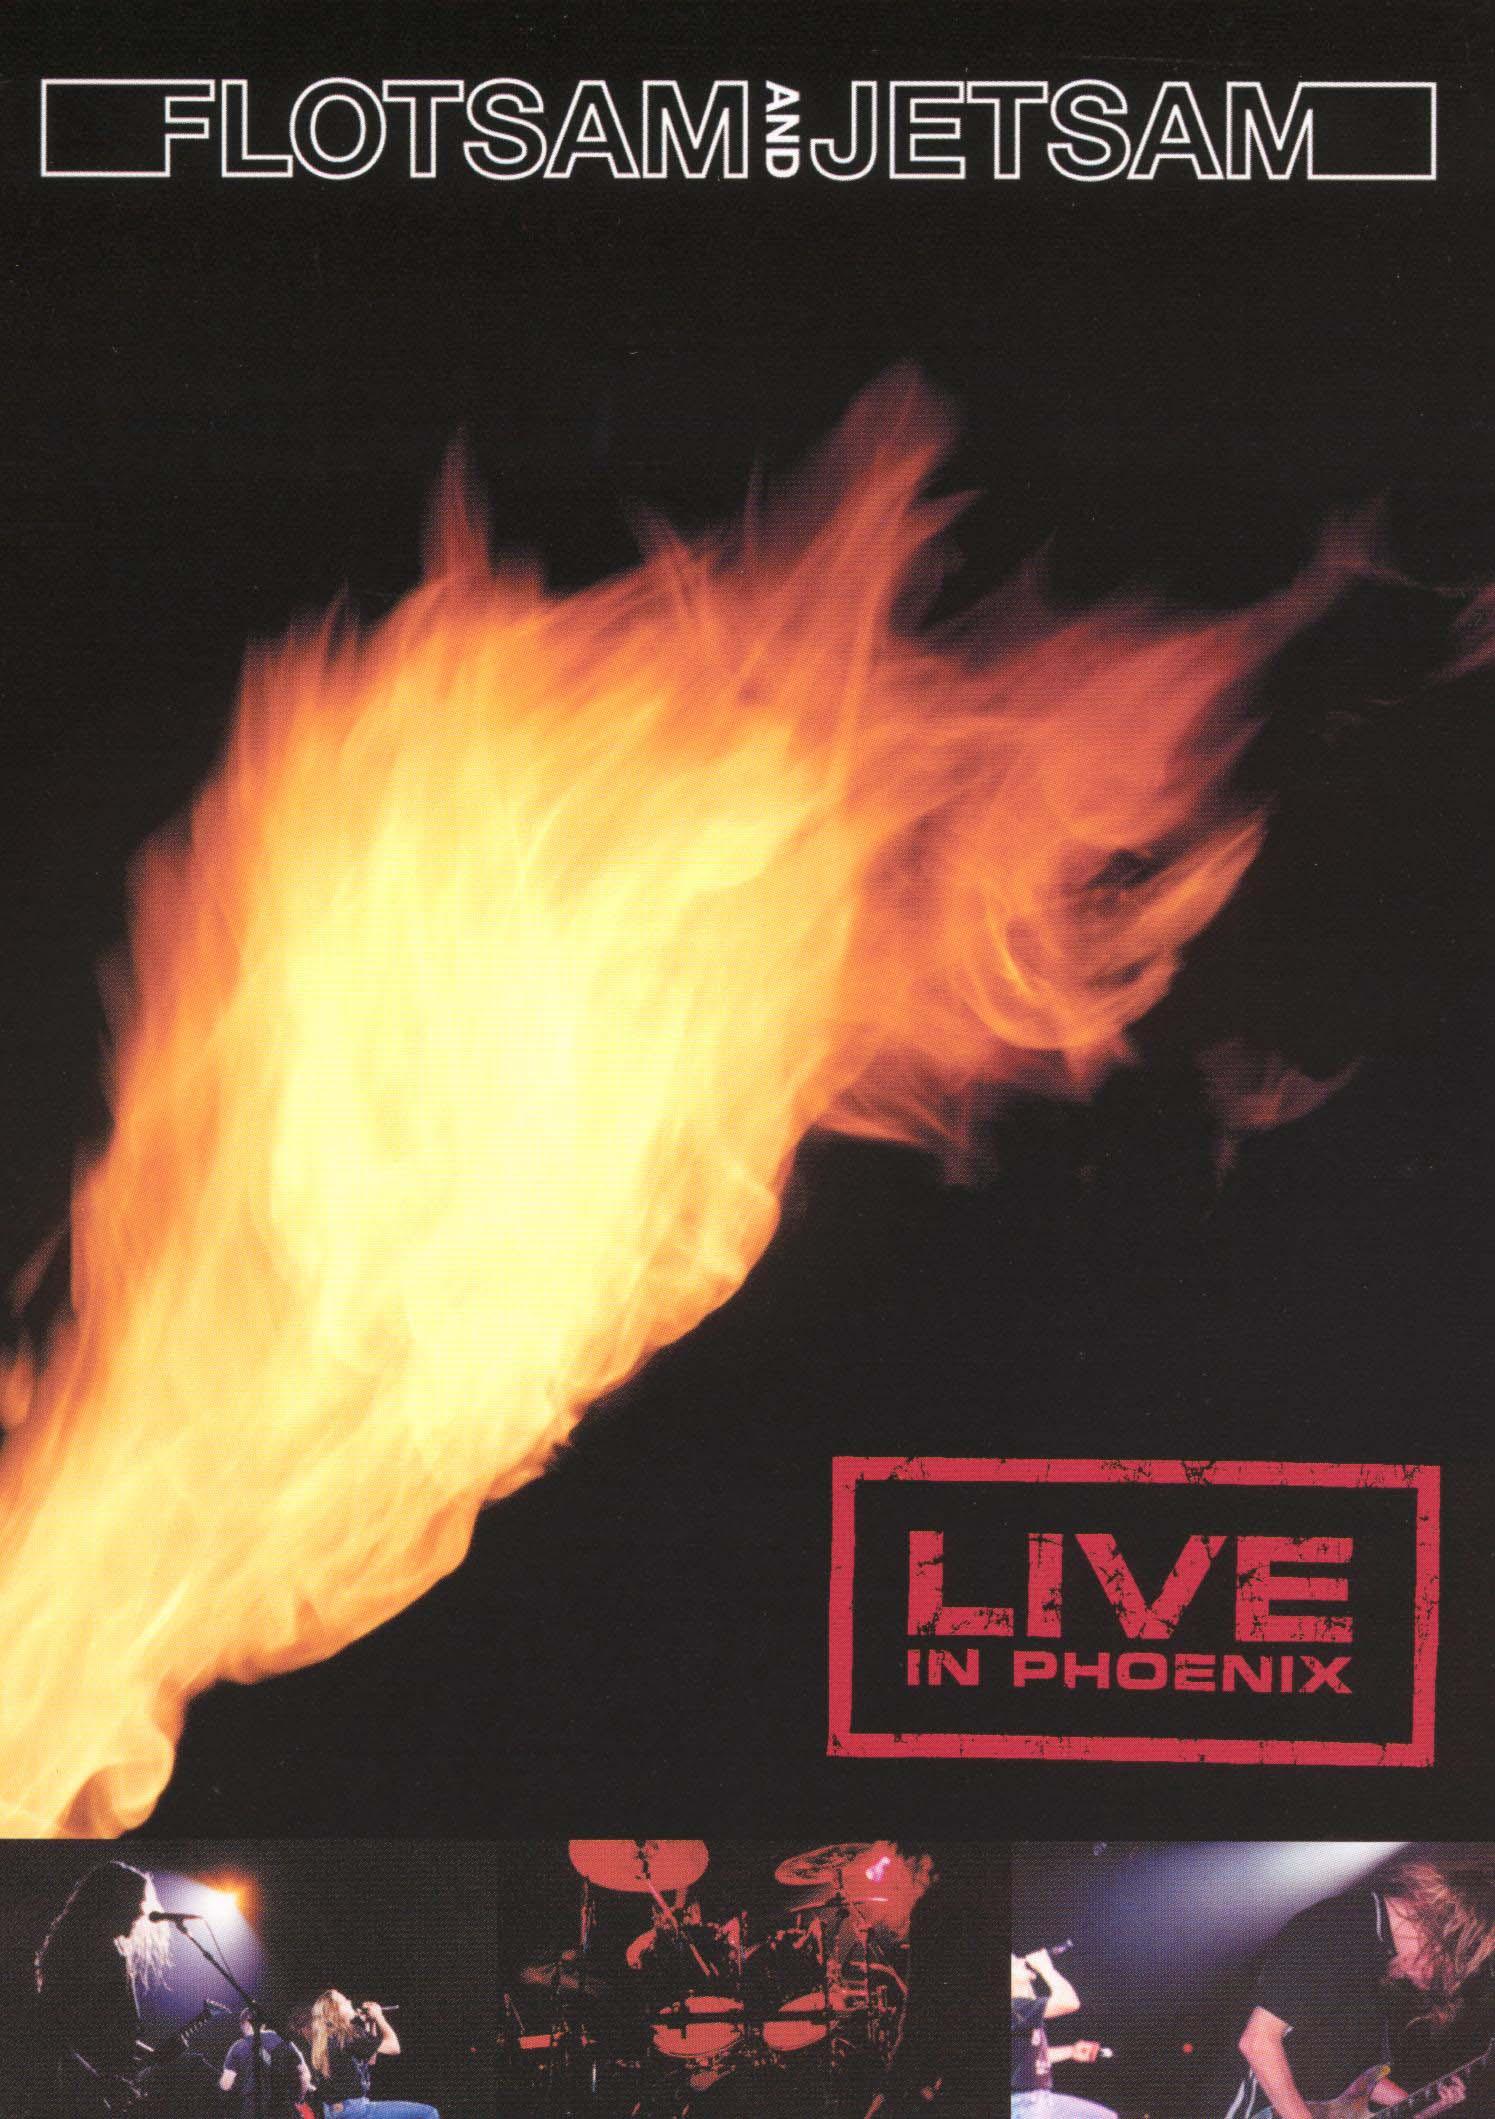 Flotsam and Jetsam: Live in Phoenix